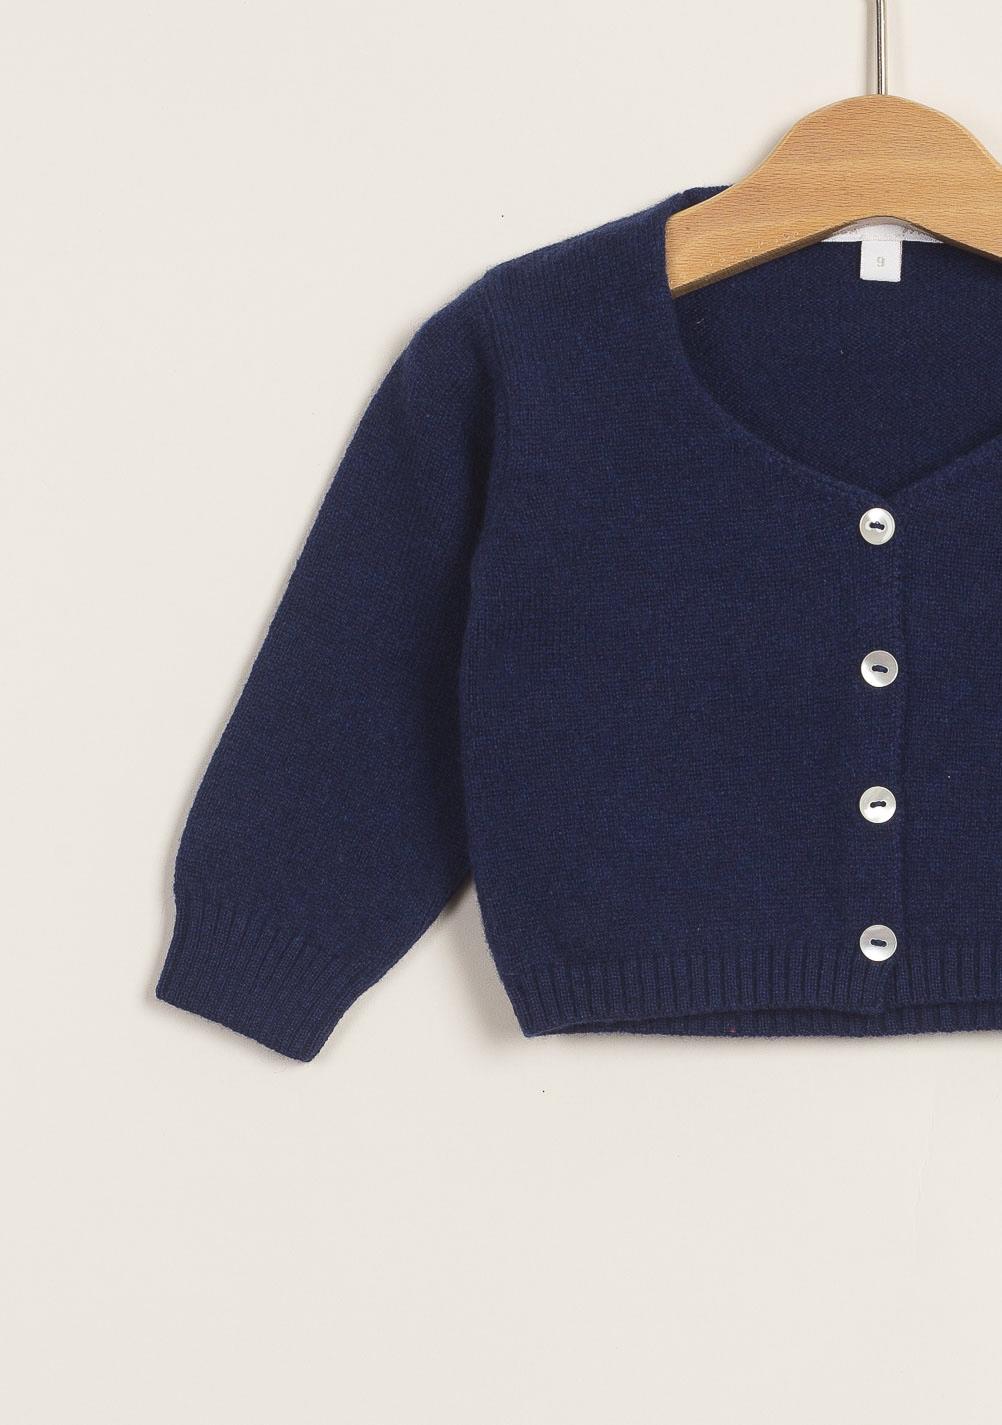 db738e15c7 M. FERRARI - Cardigan scaldacuore in lana merinos blu - The Dressing ...